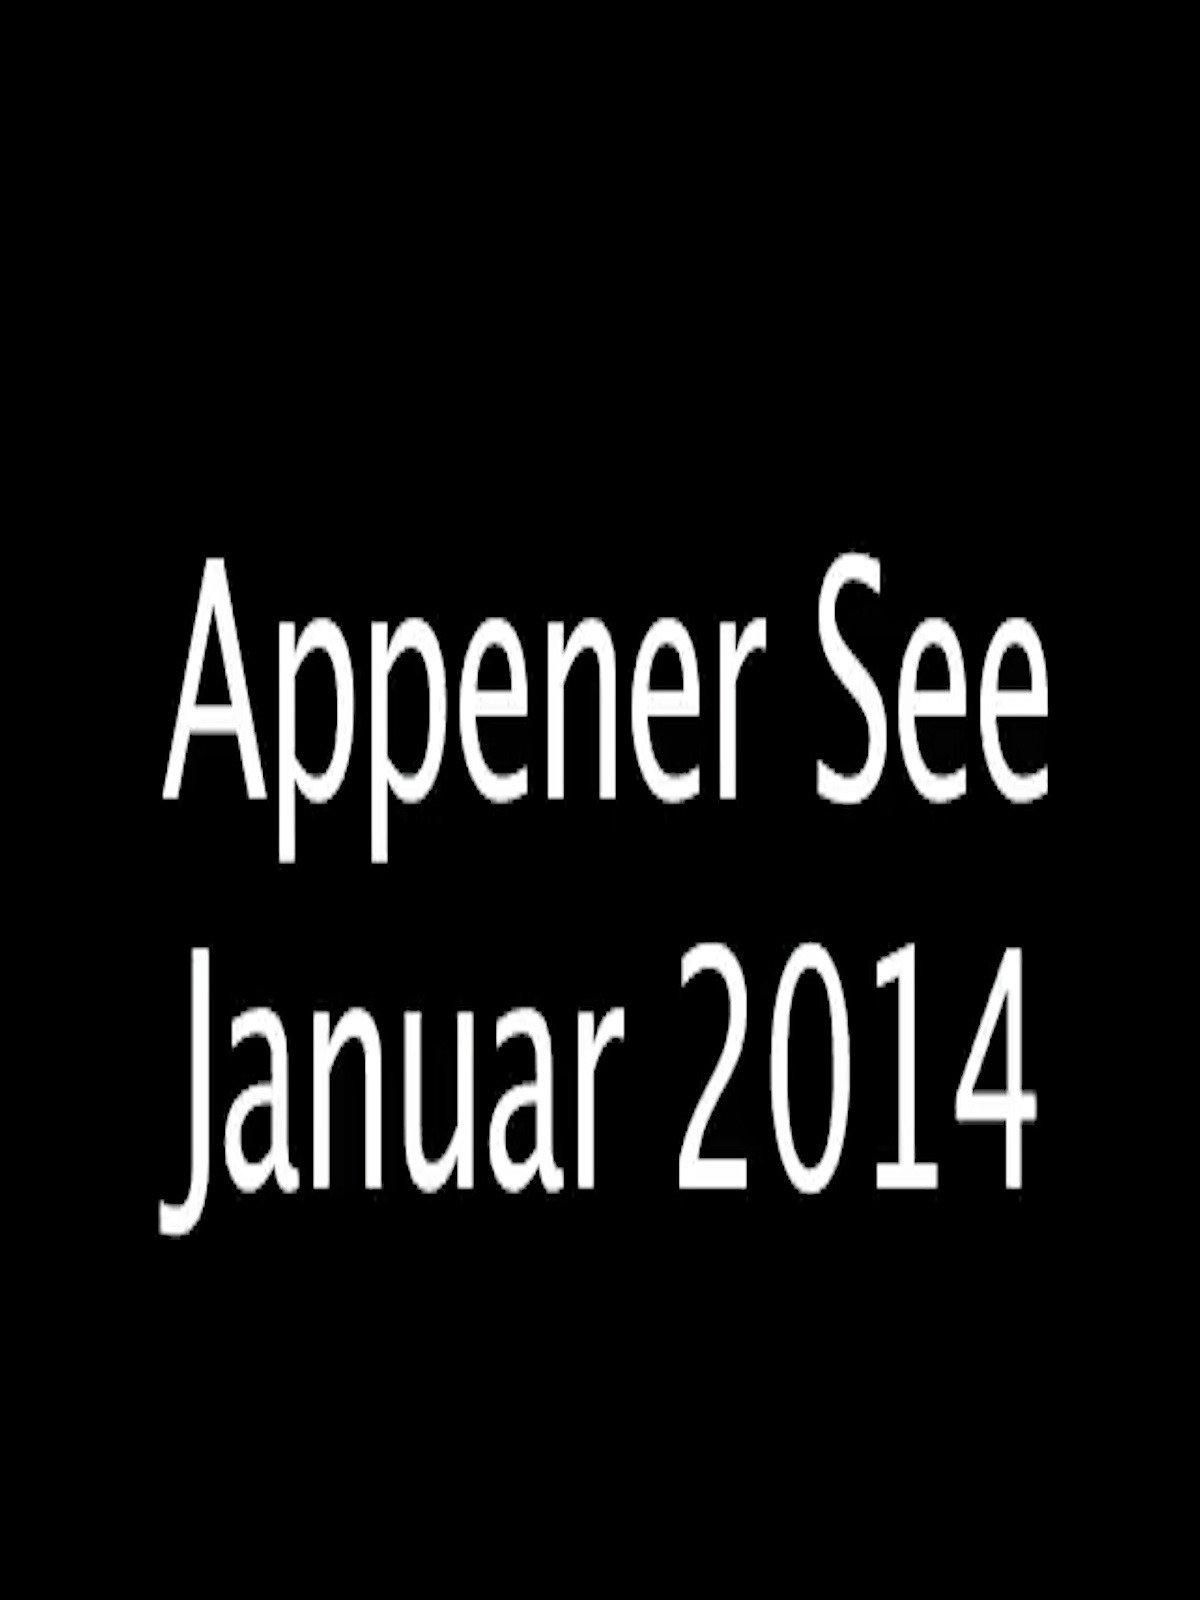 Appener See Januar 2014